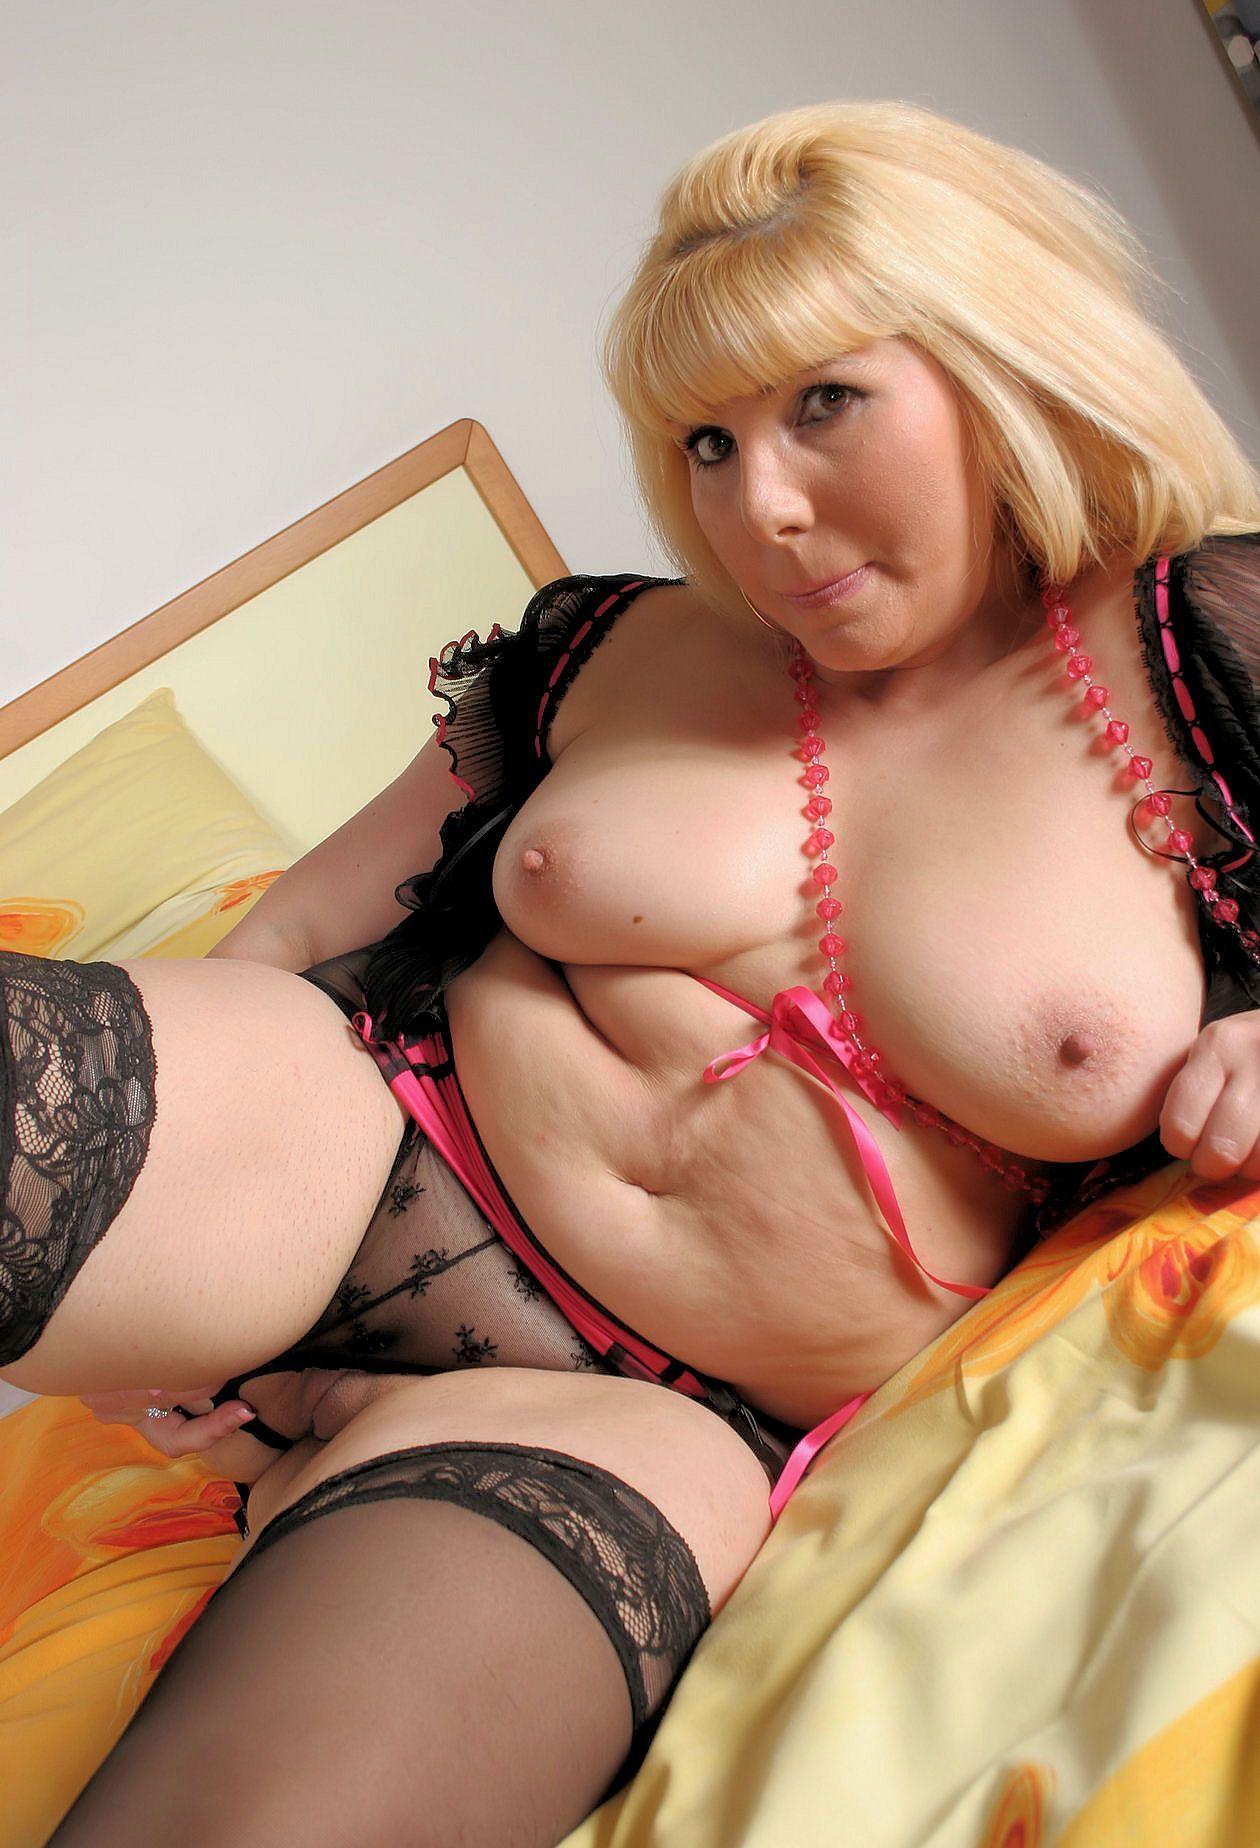 femmes rondes grosses fesses gros nichons